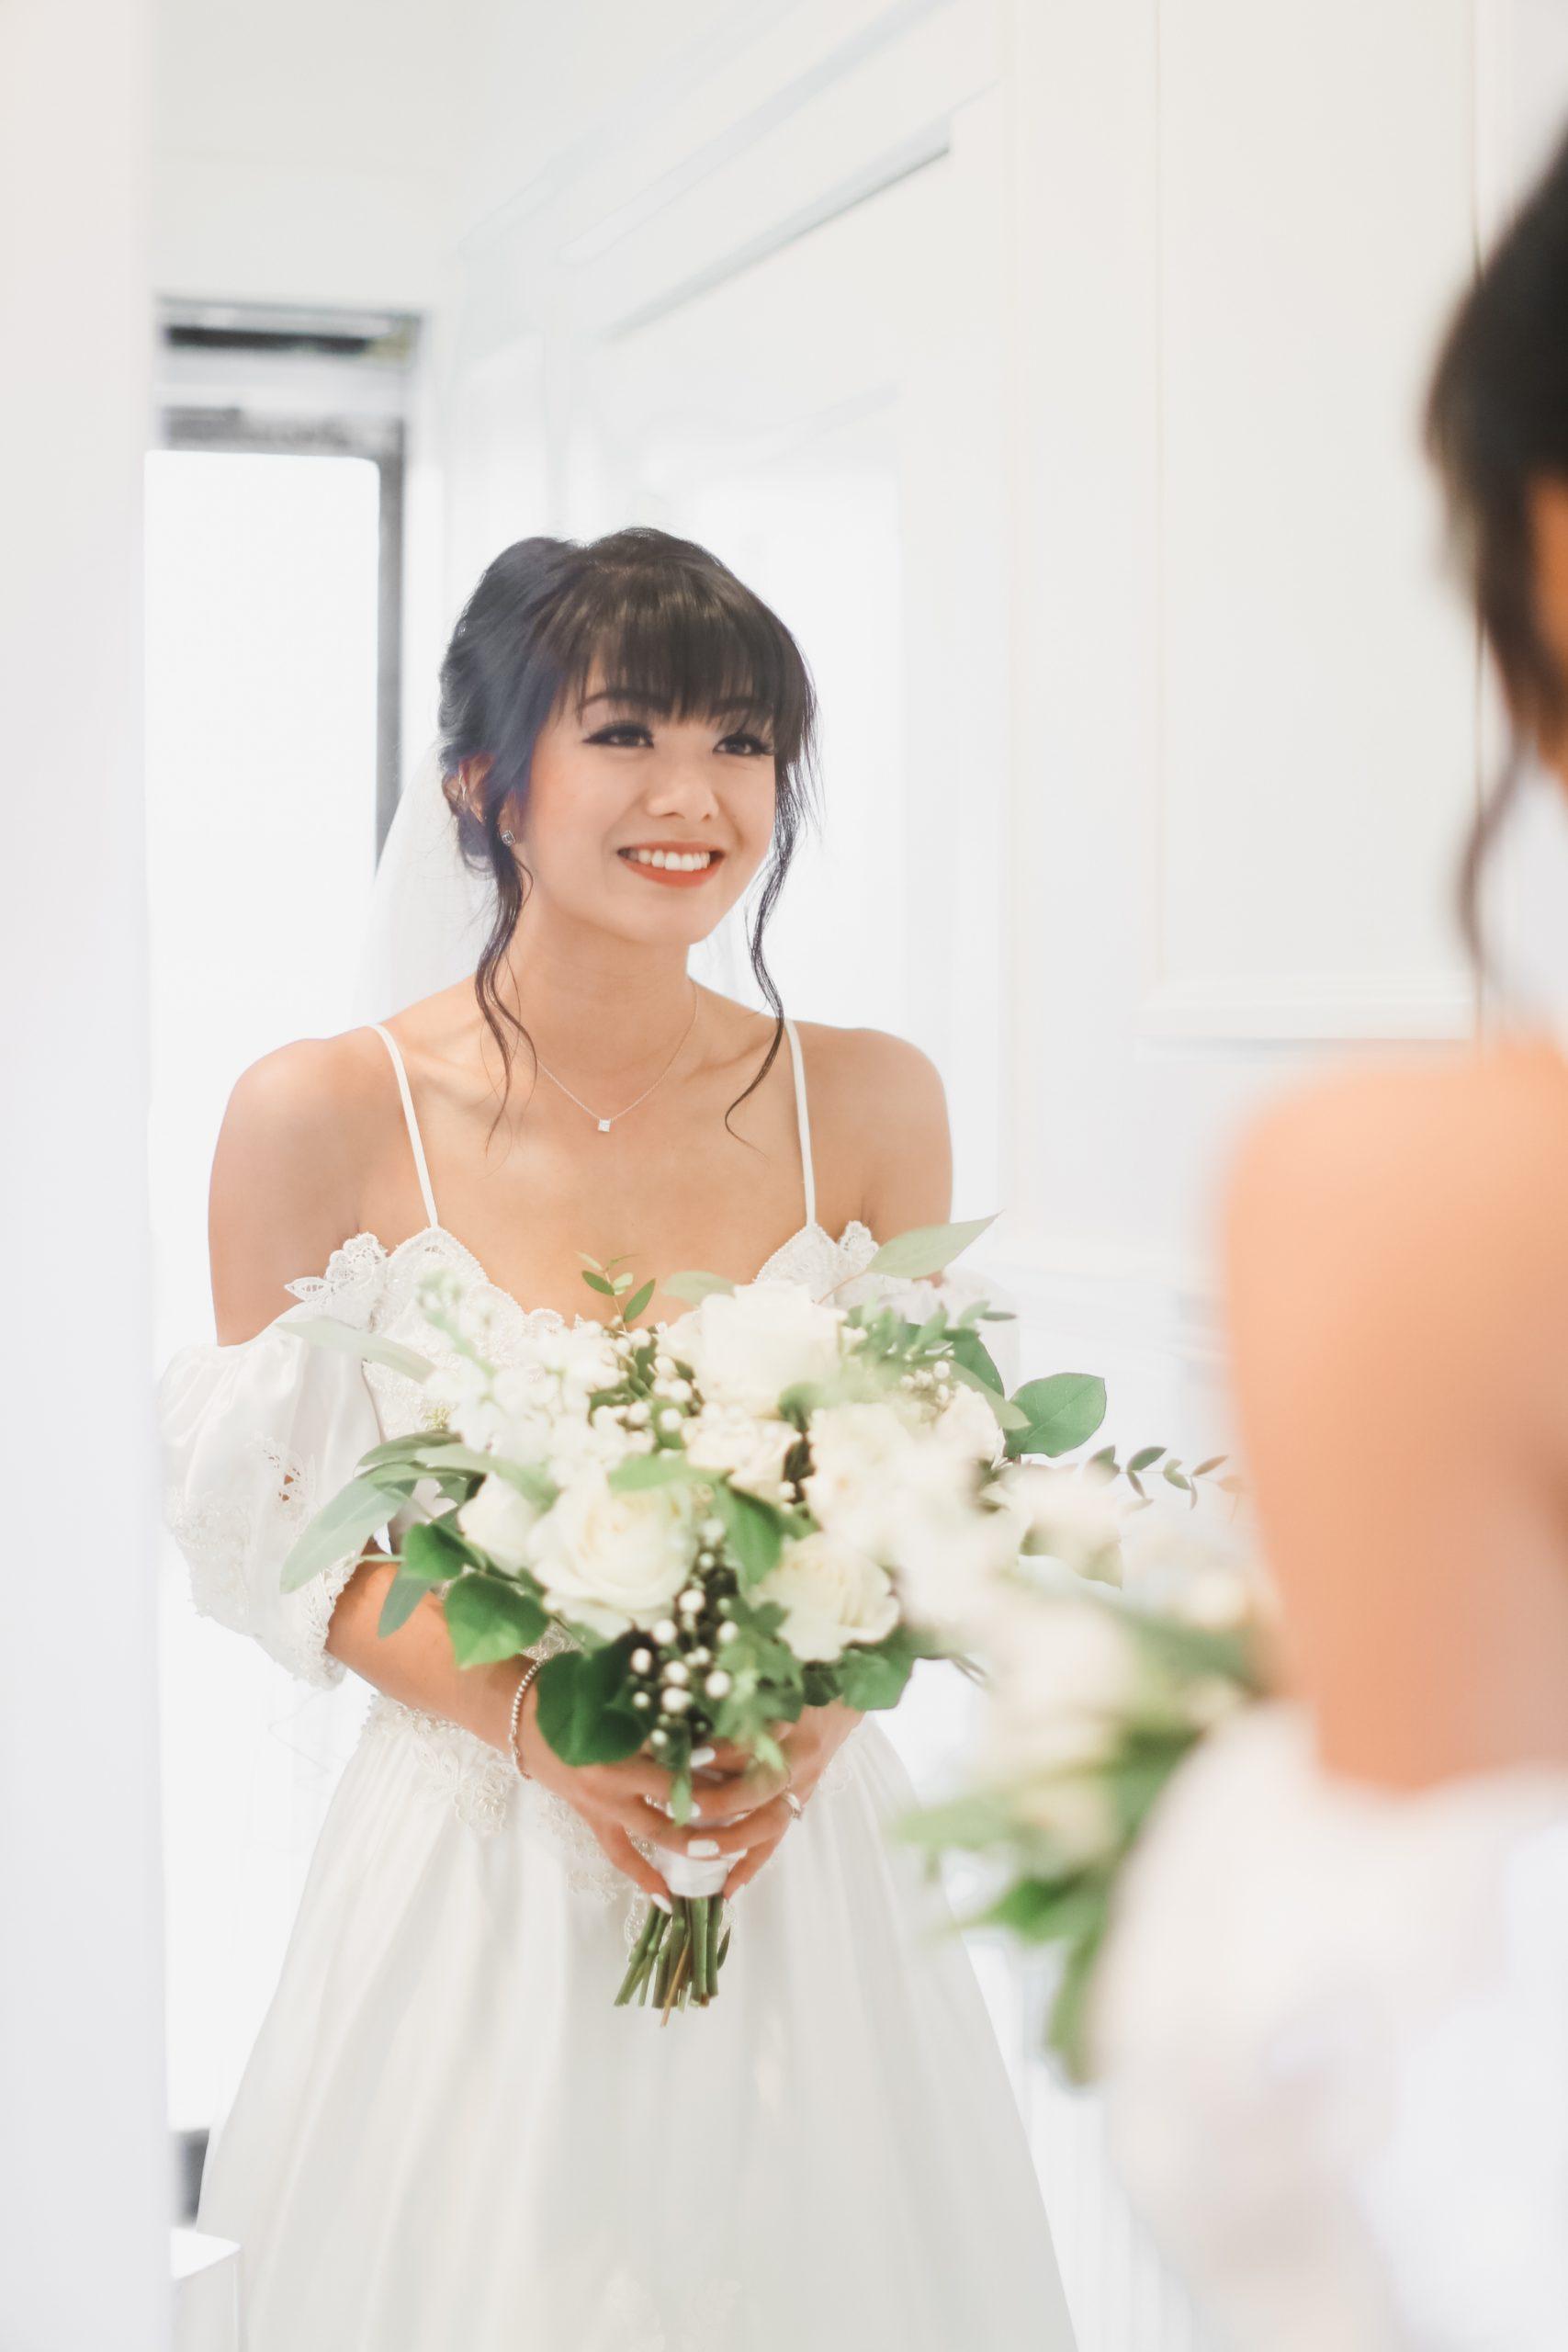 Emblaze Photography Pre-wedding Photographers